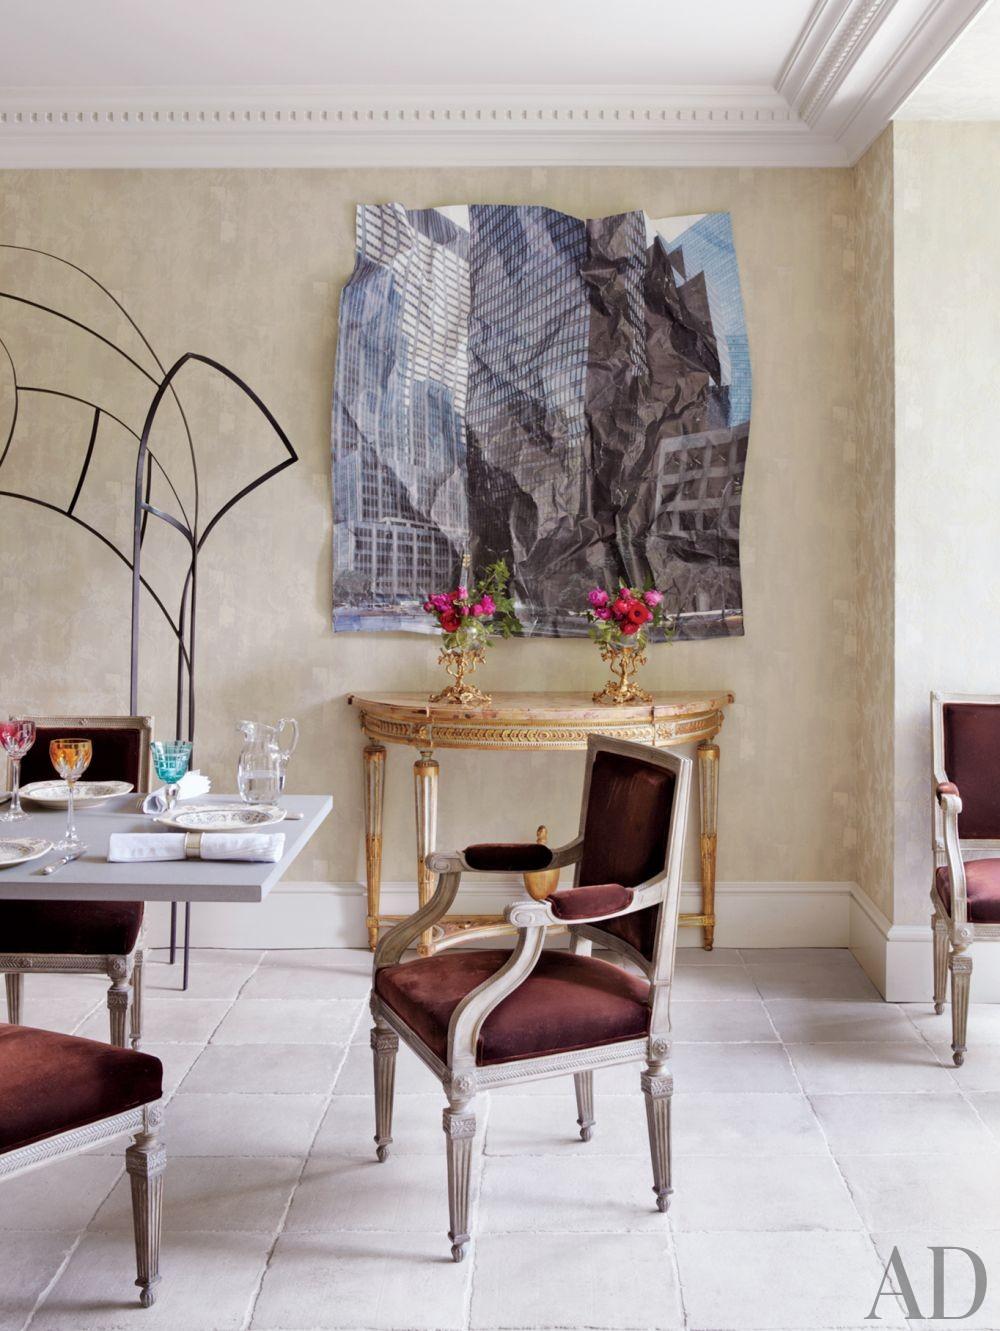 Traditional Dining Room by El Estudio de Isabel López-Quesada and Pablo Carvajal Urquijo Architect in Madrid, Spain